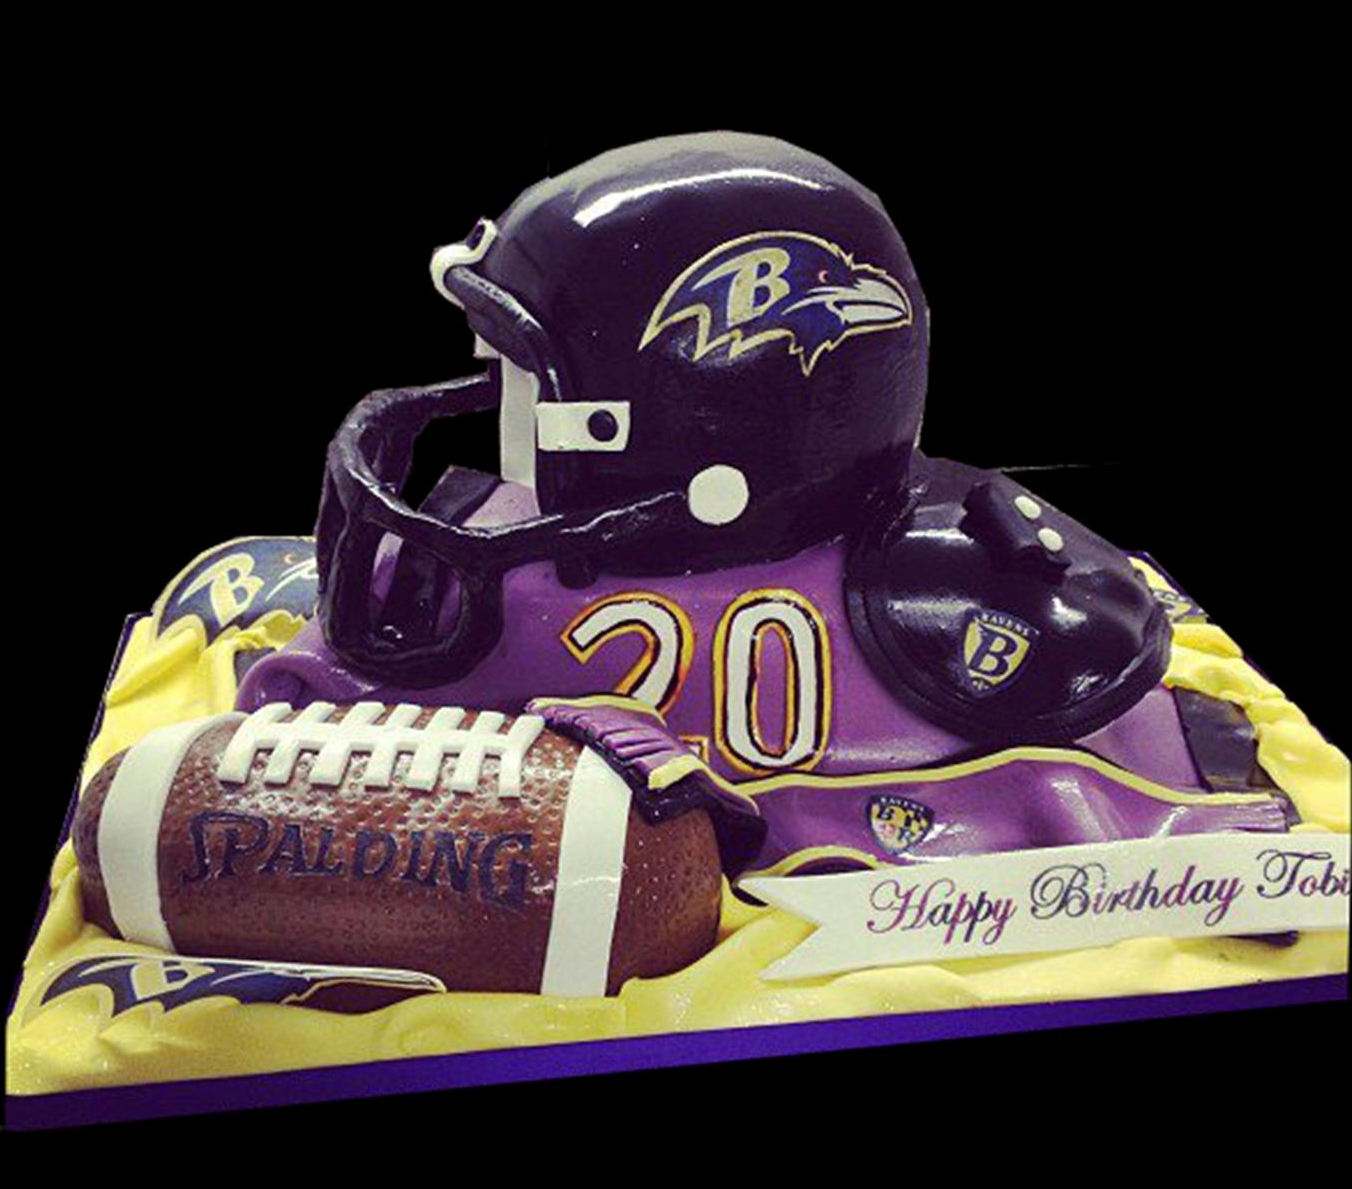 Baltimore Ravens Birthday Cake